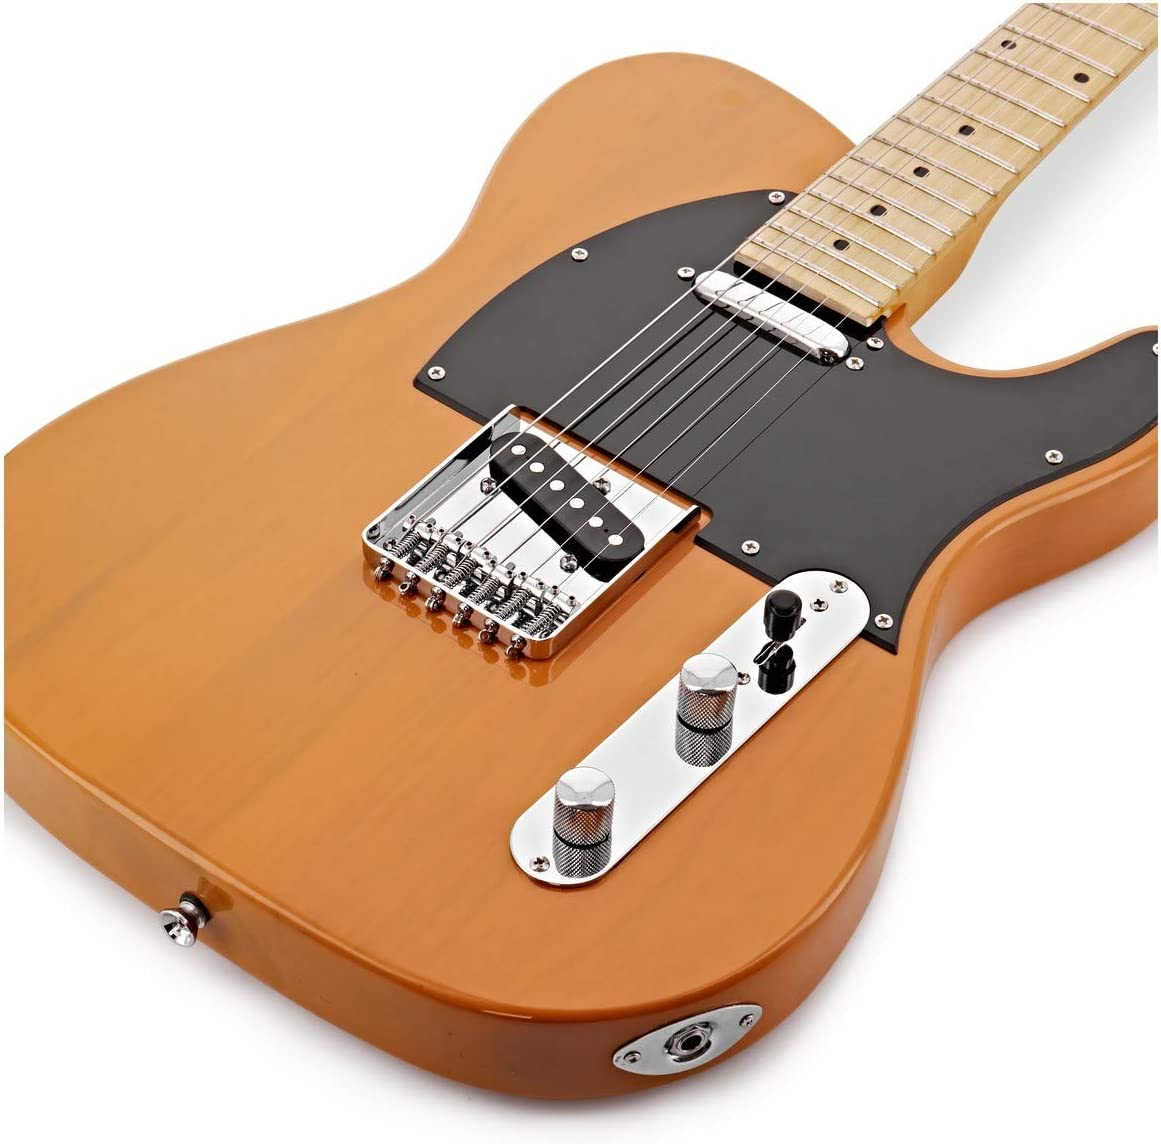 Paquete de Guitarra Electrica Knoxville + Amplificador Butterscotch: Amazon.es: Instrumentos musicales